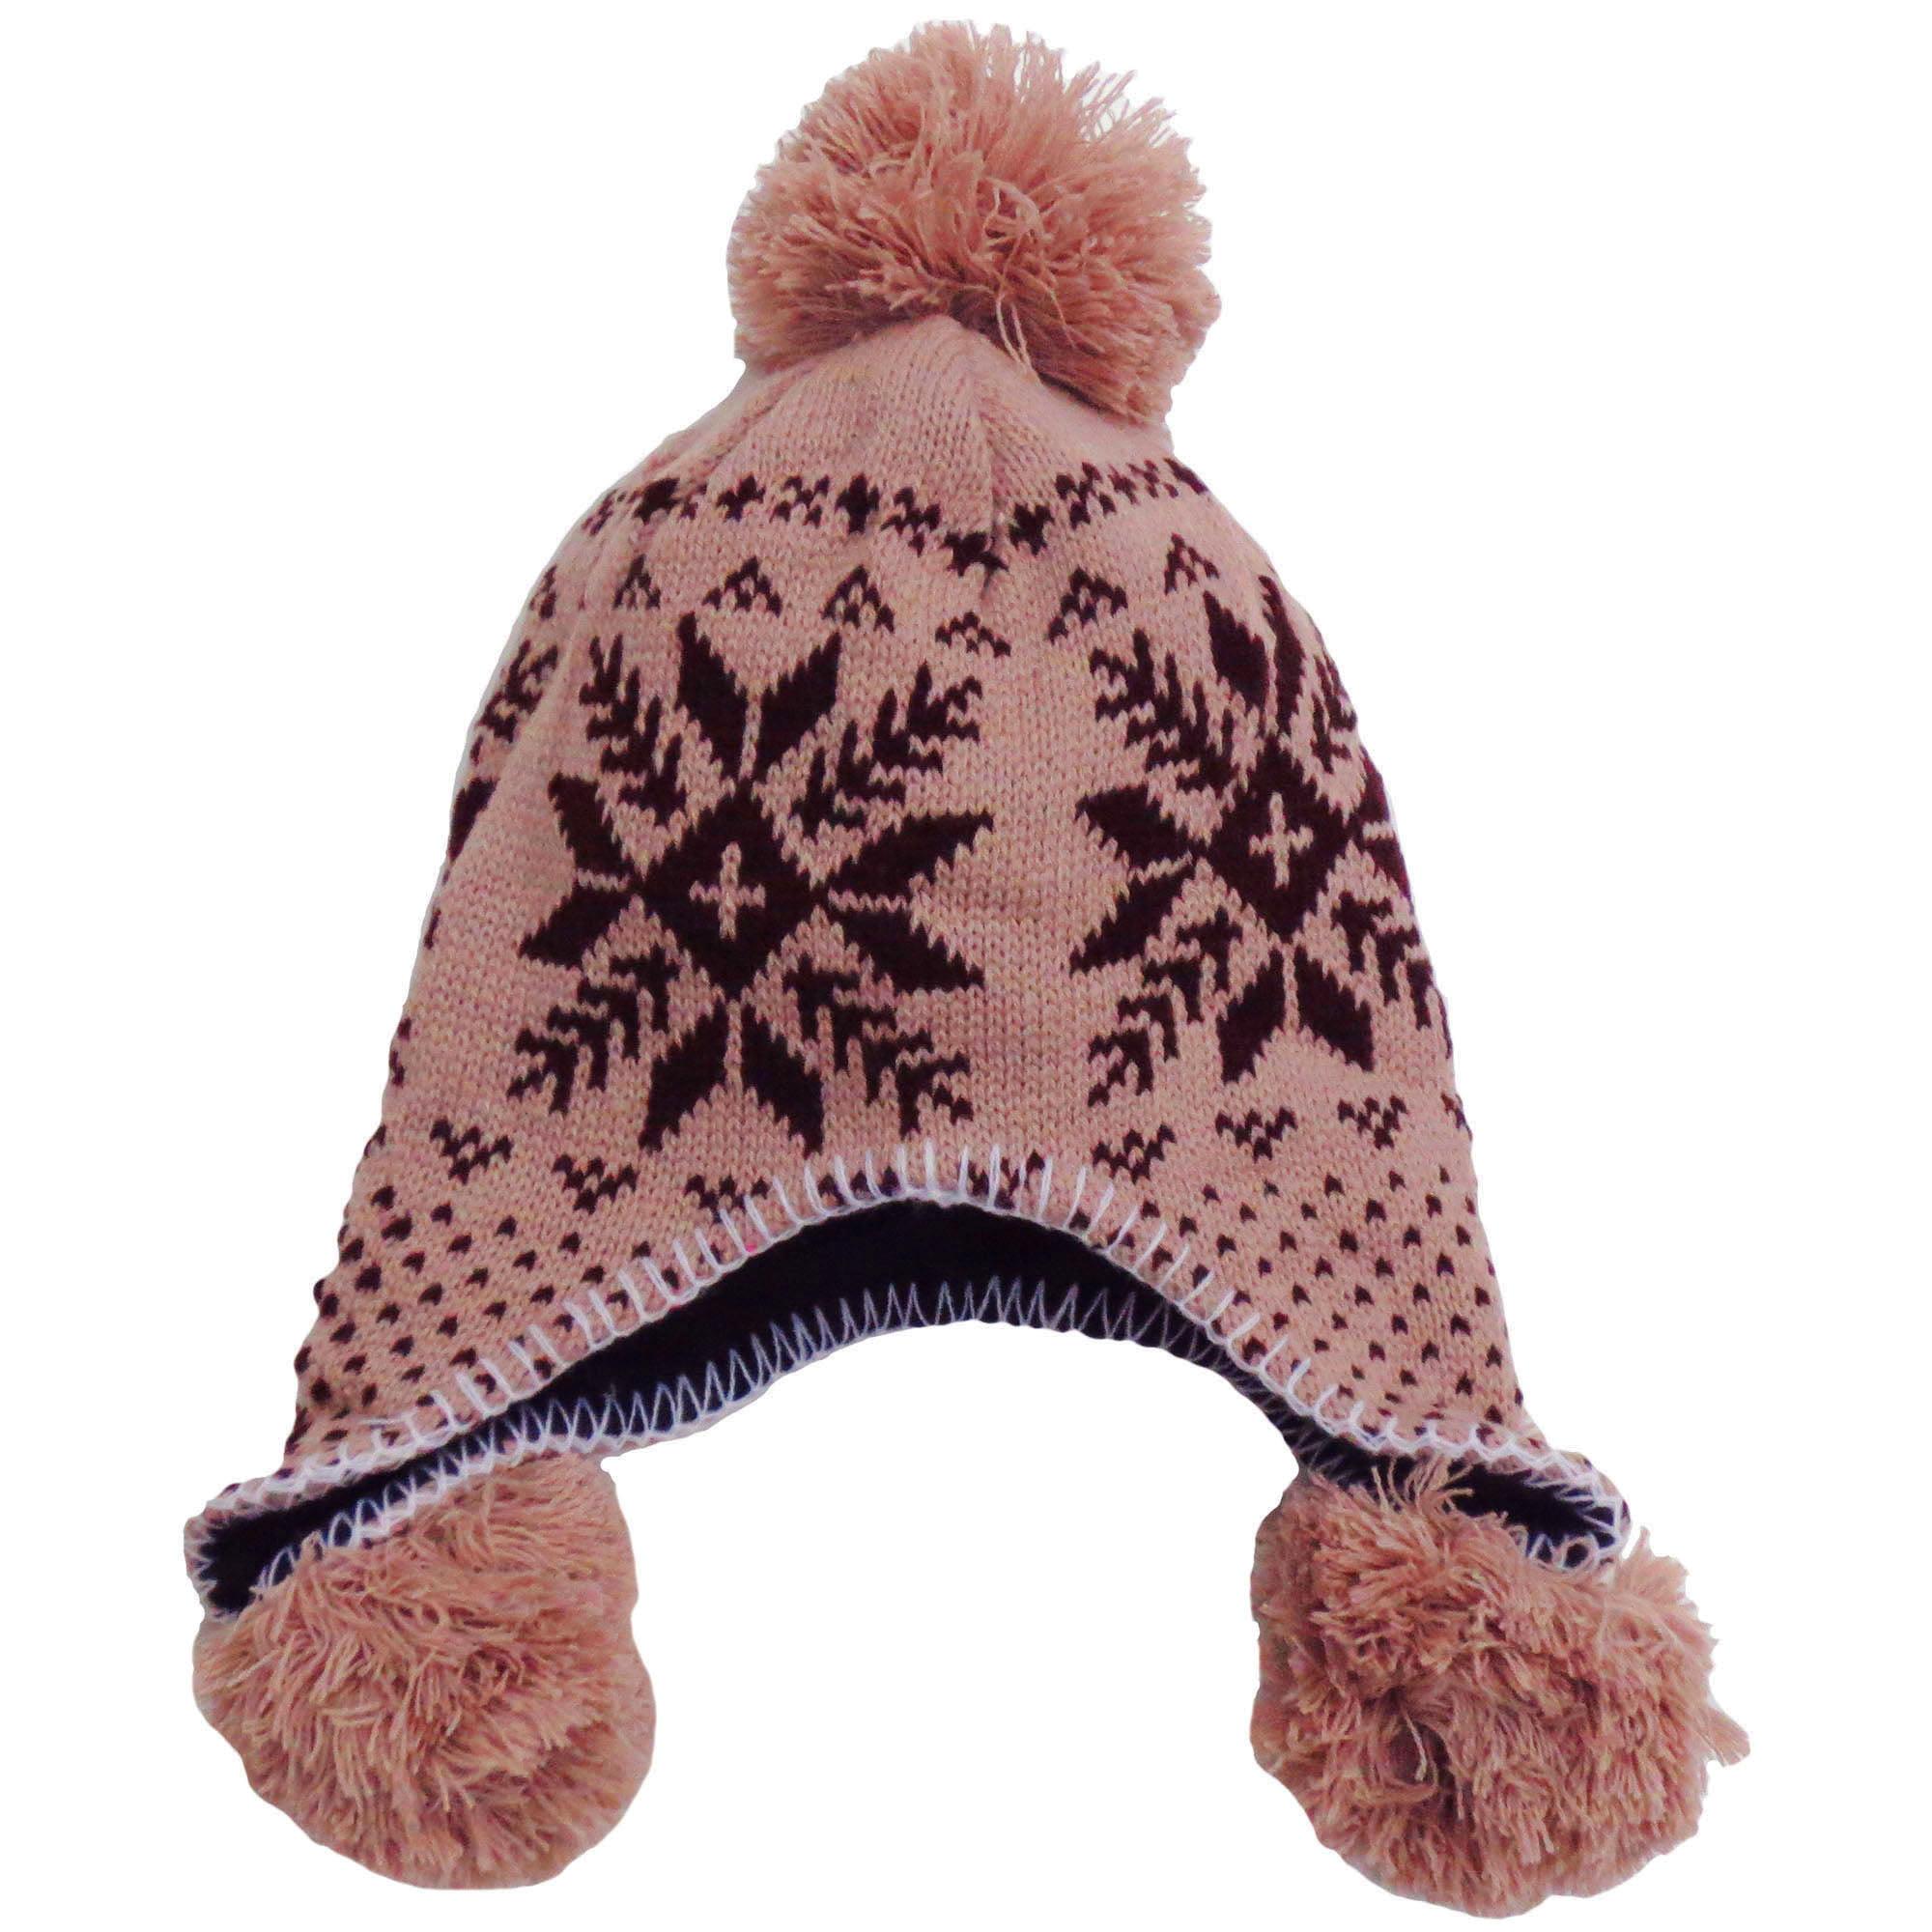 cde8e243d47c3 Basilica - Women s Knit Beanie with Pom Winter Earflap Snow Hat ...